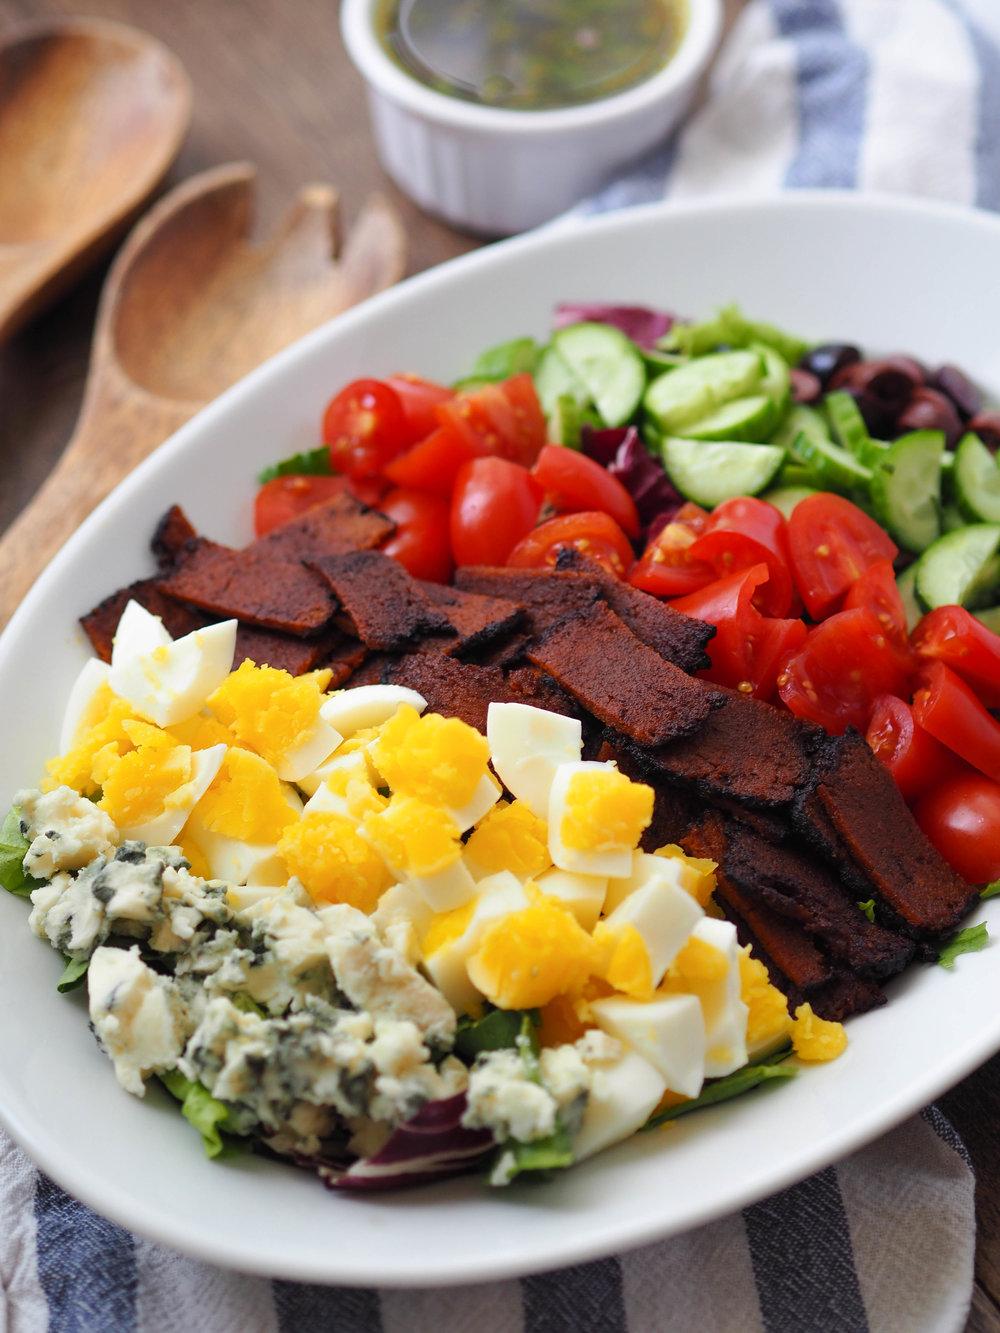 Make this vegetarian BLT inspired salad with tempeh bacon! #vegetarian #salad #blt #healthyrecipe